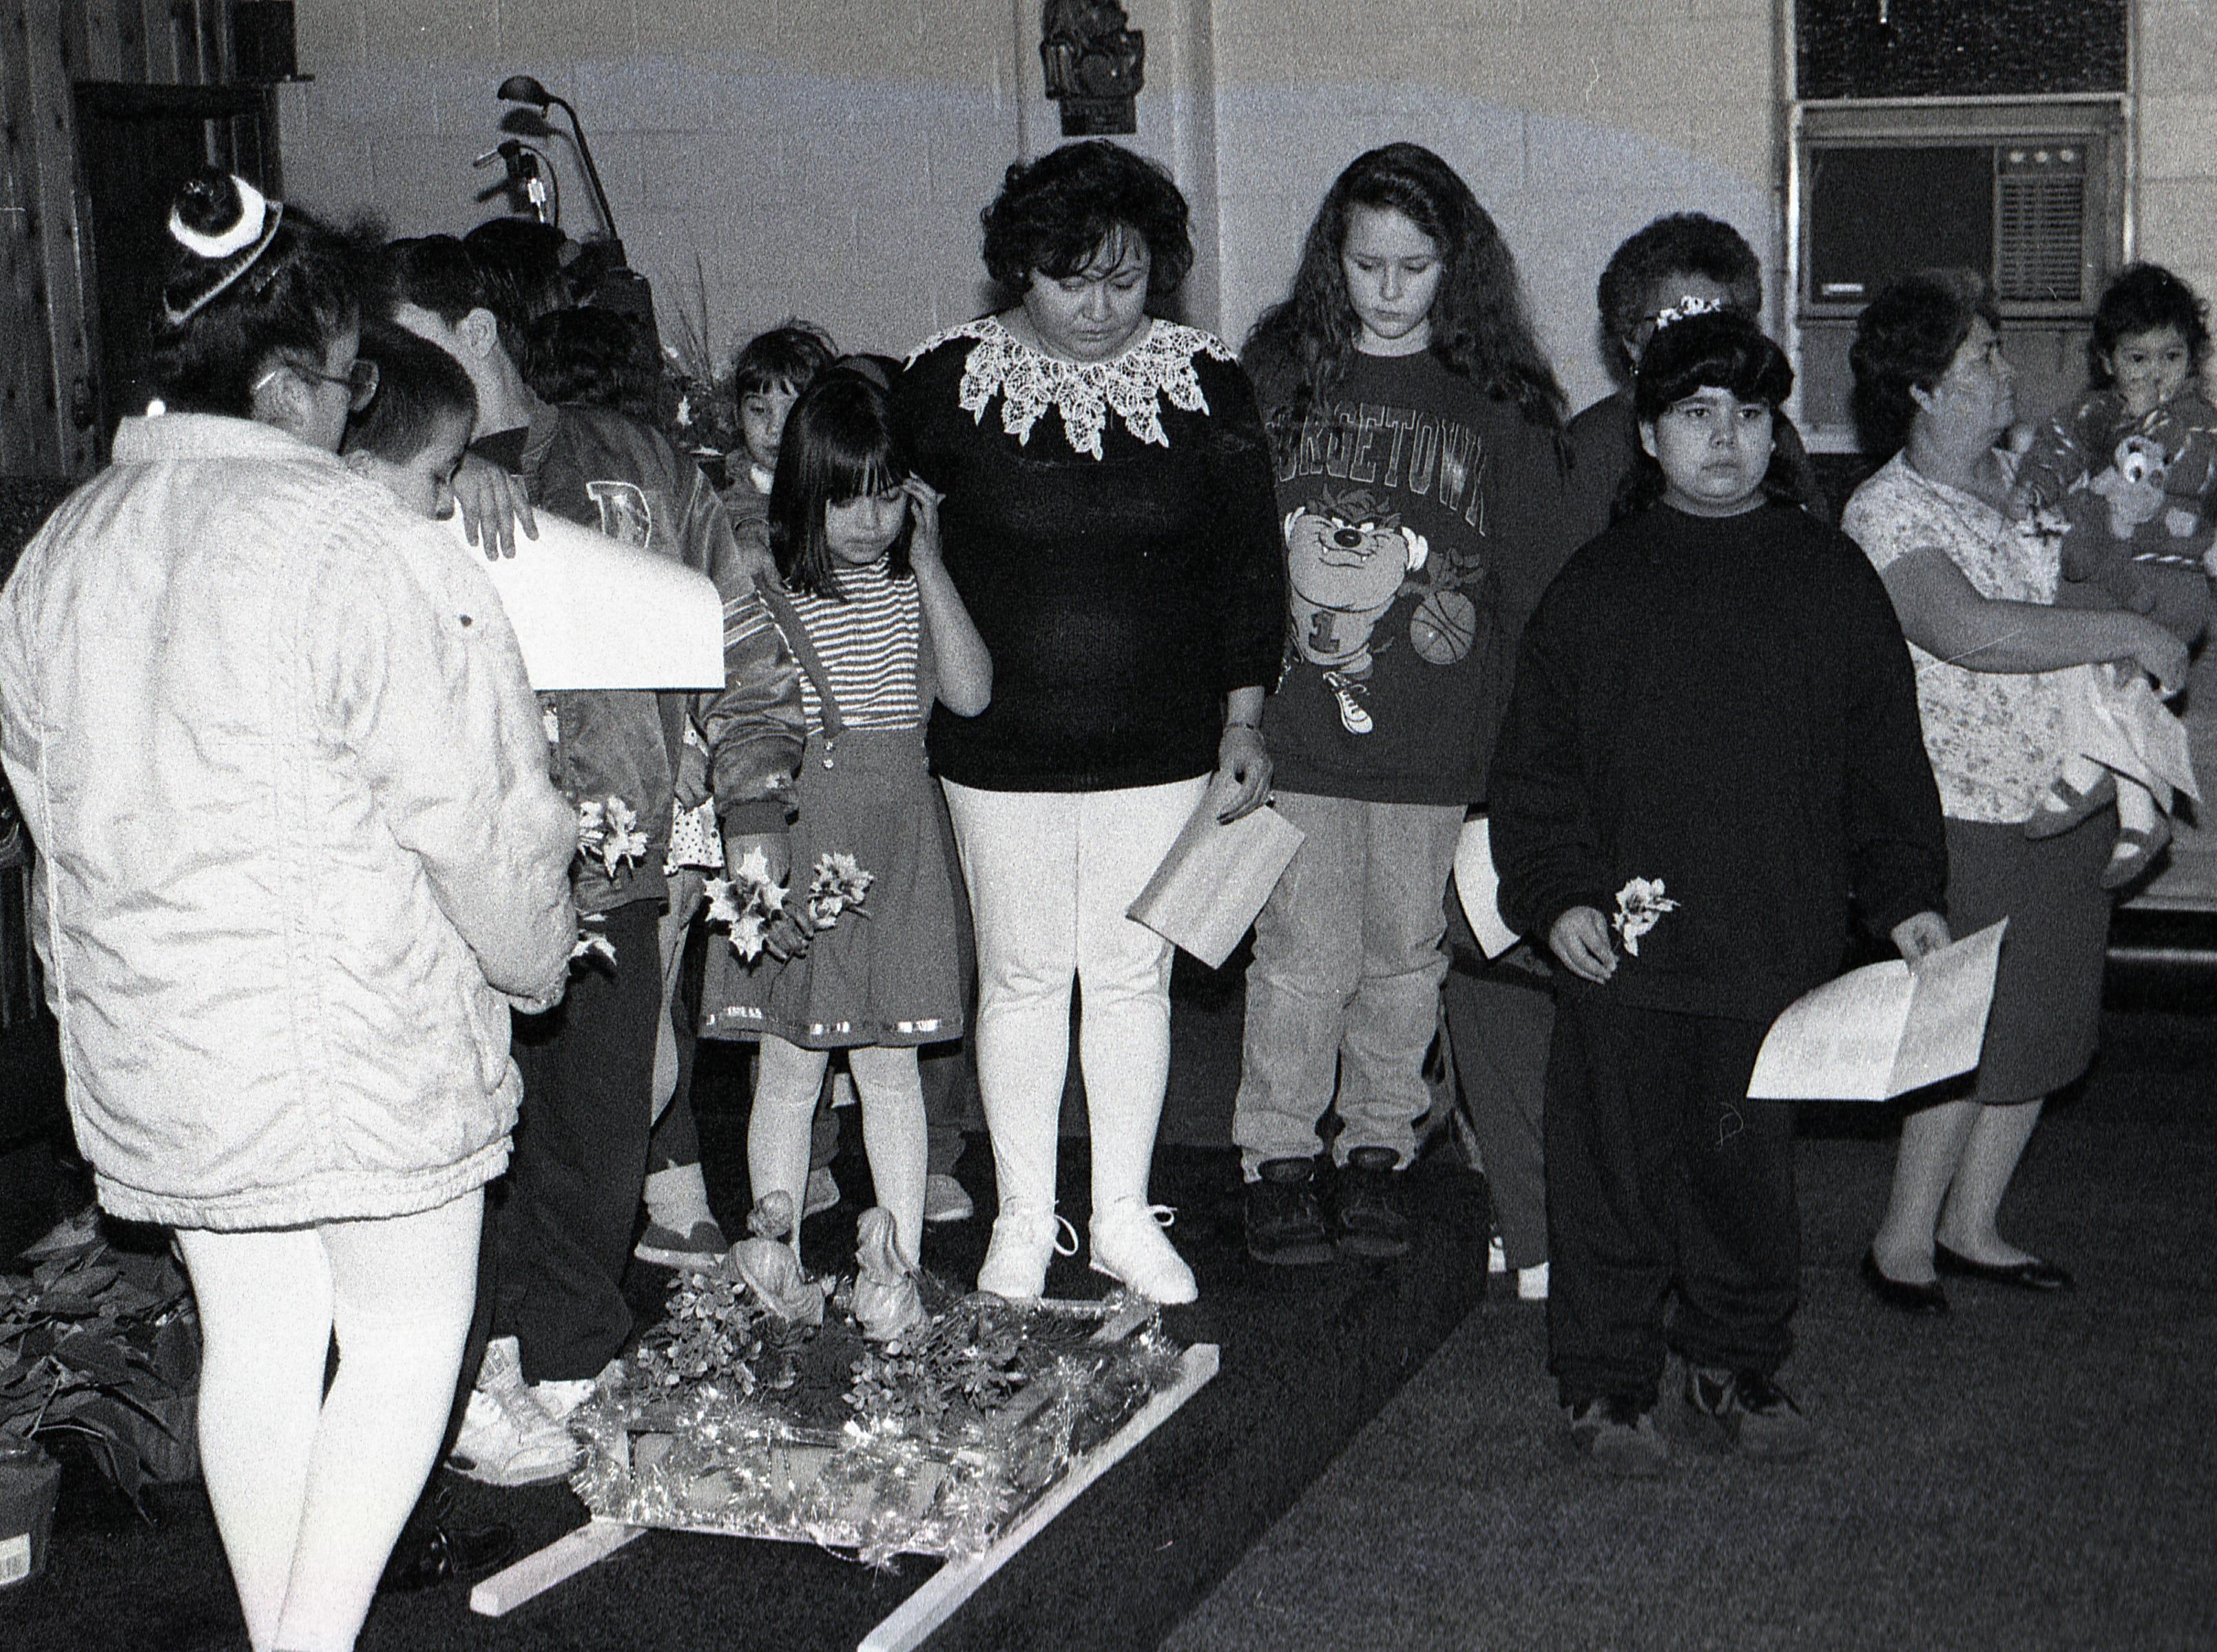 Latin American Christmas festival at Cristo Rey Church, 1994.